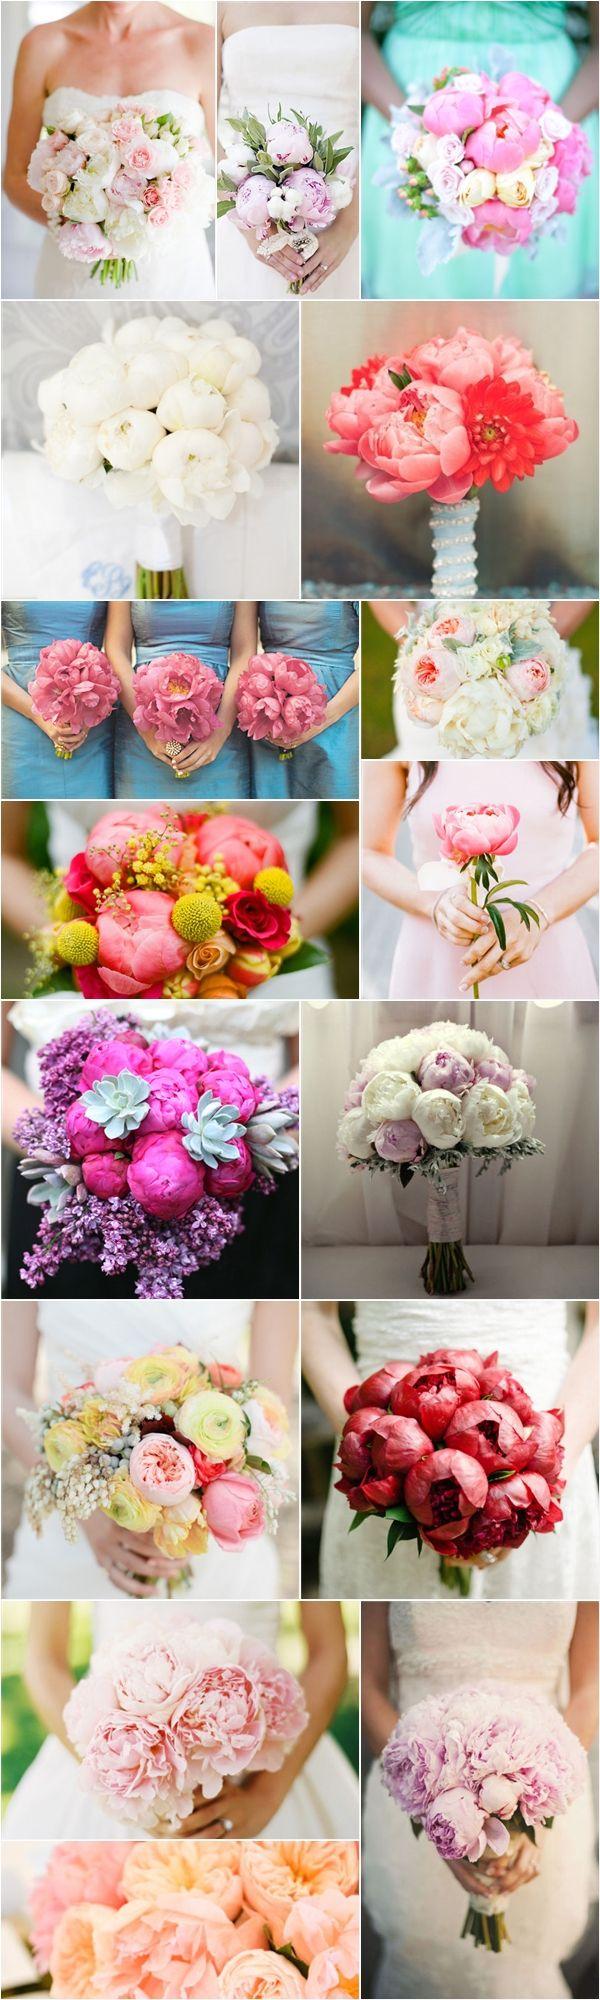 best Dream Wedding images on Pinterest Weddings Casamento